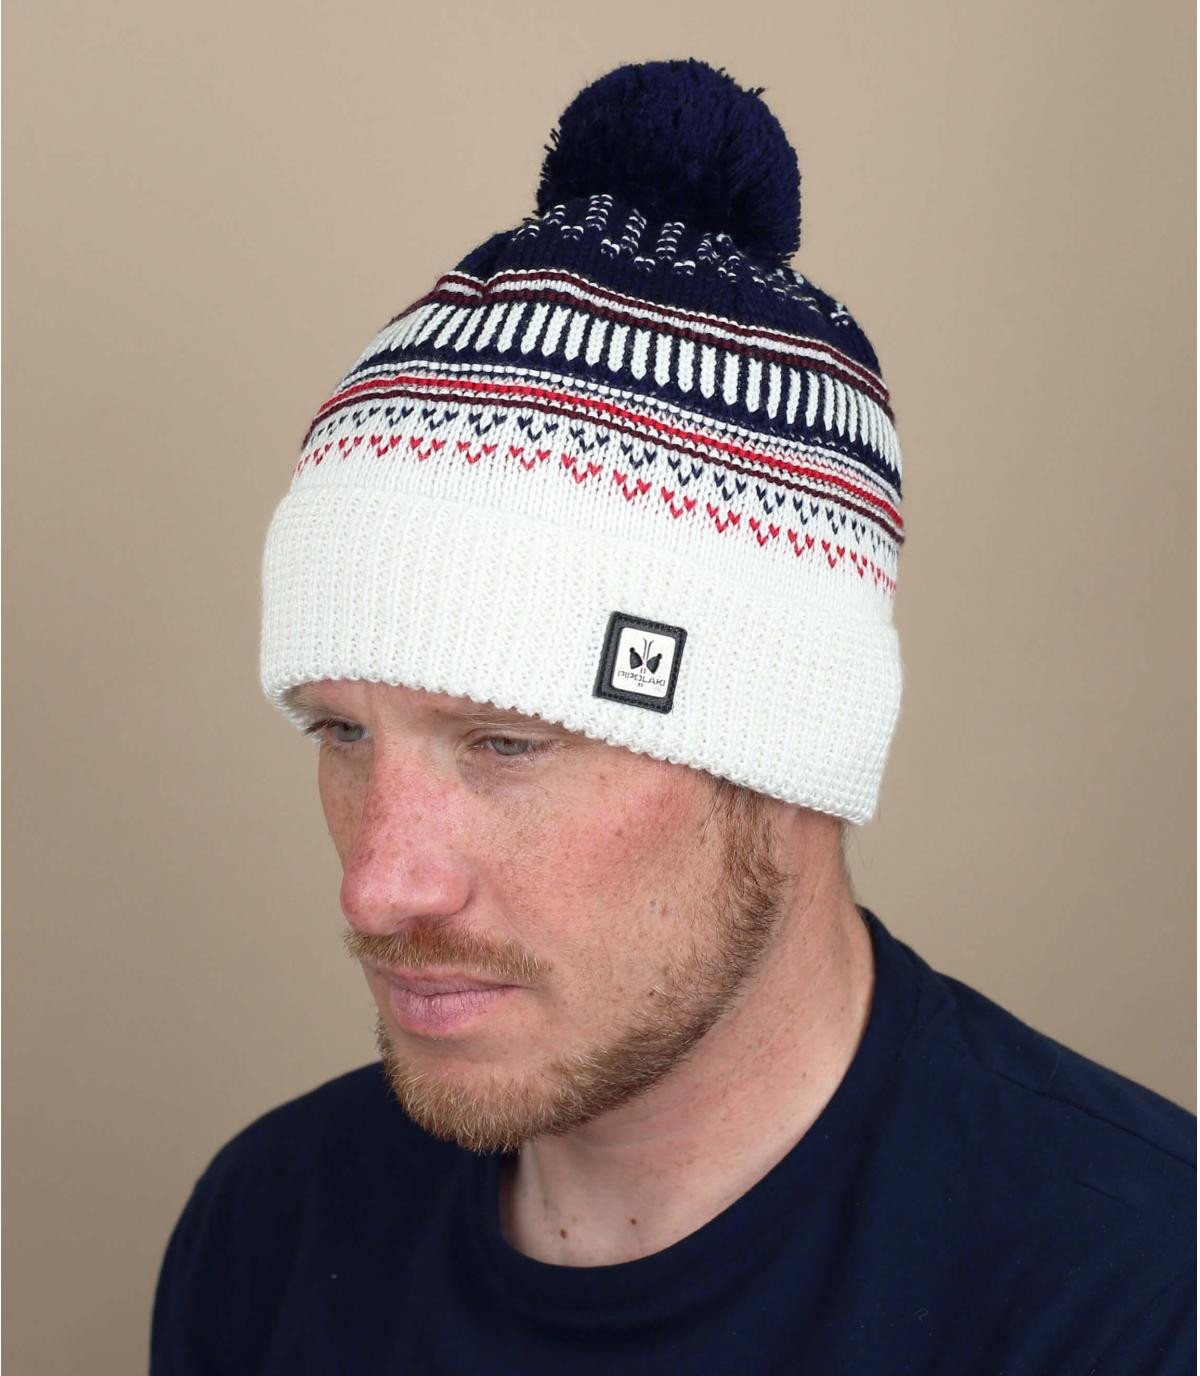 wit blauwe pompon hoed